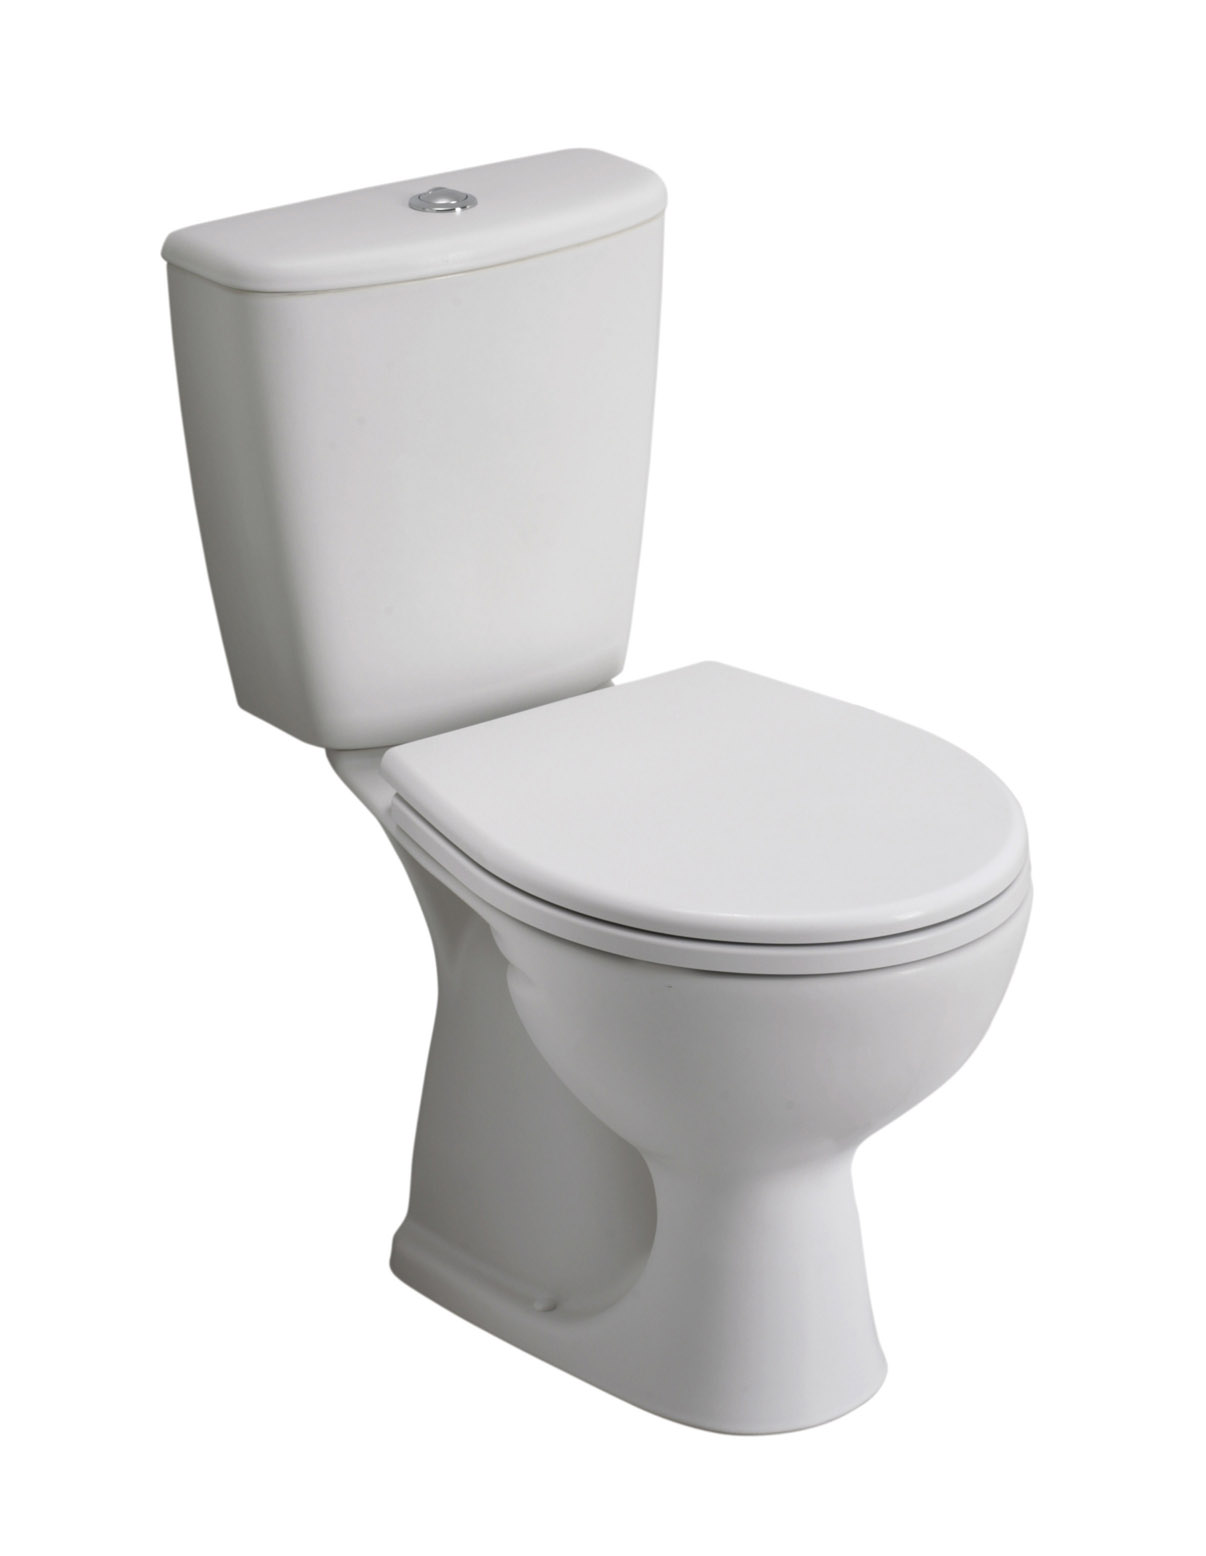 wc/klozety KOLO Rekord K99005 WC kombi